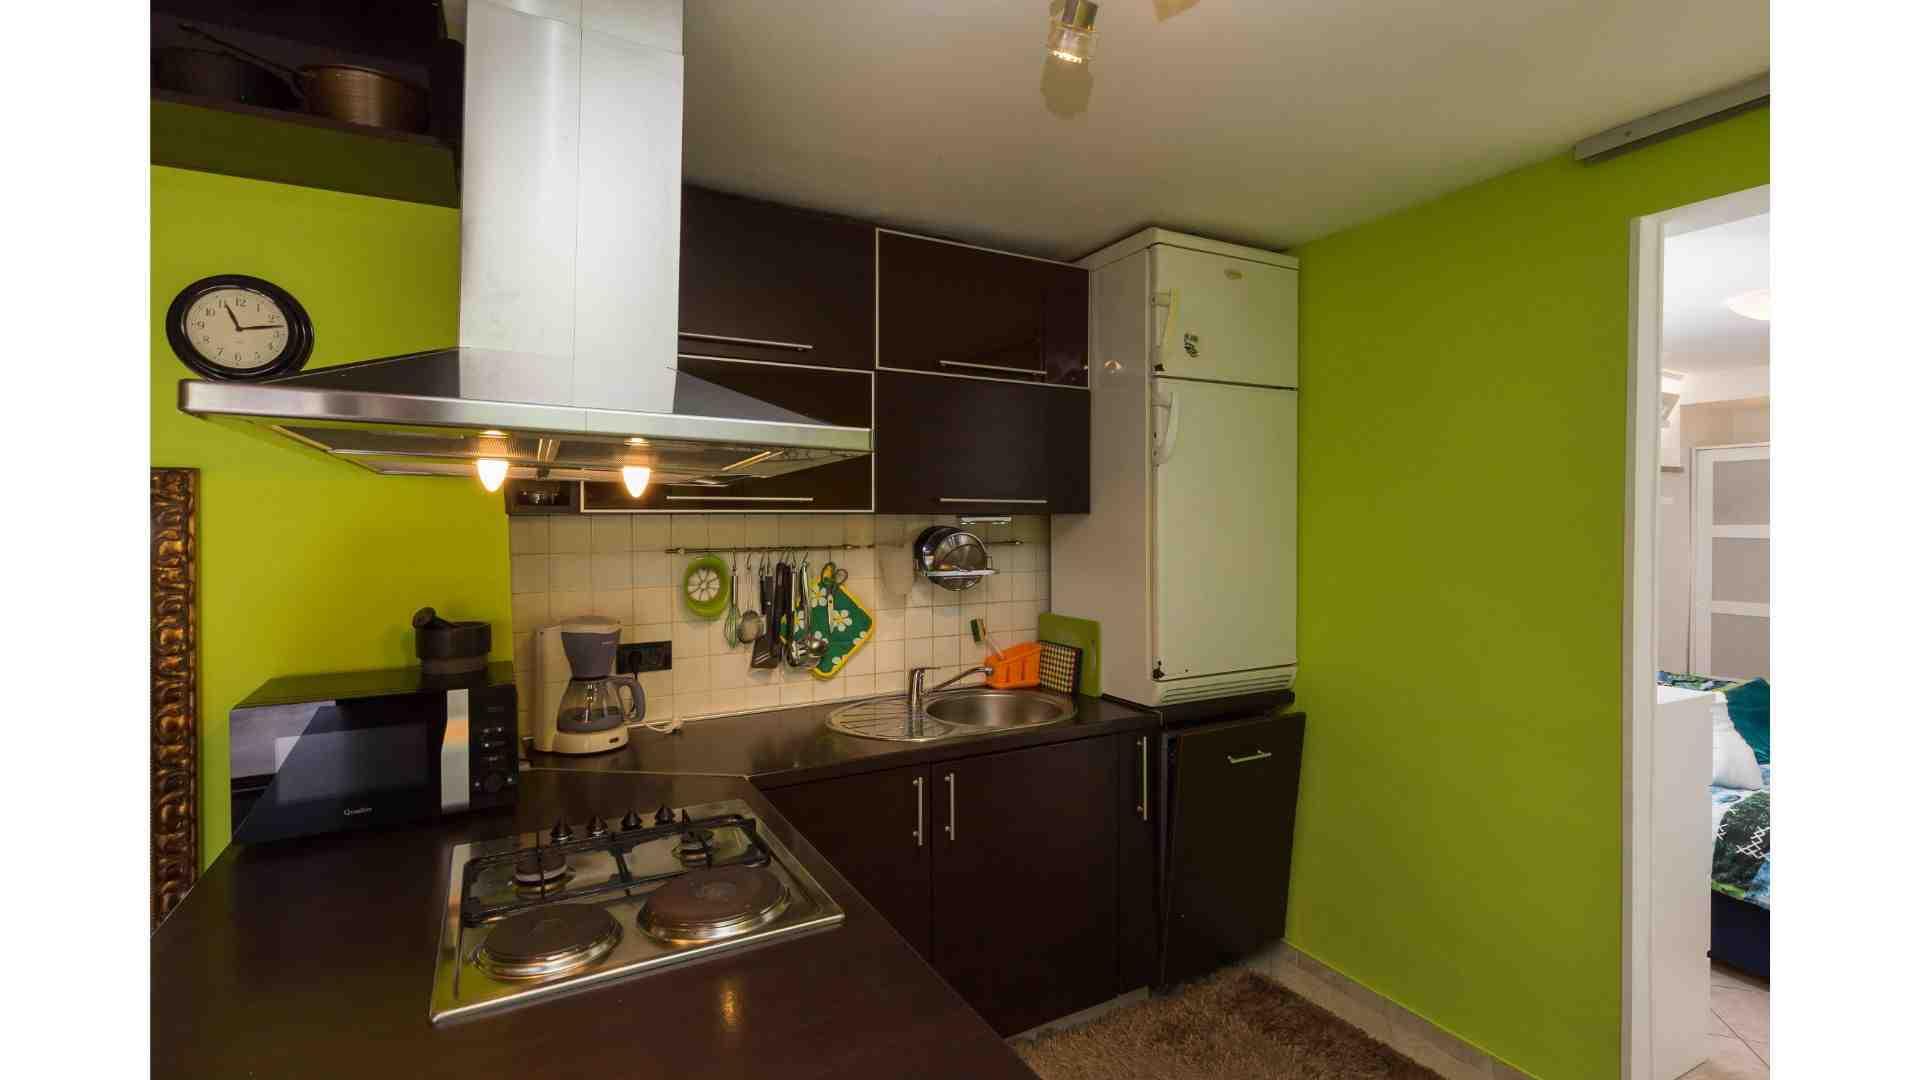 Appartementen Miljkovic 37646, Lapad, Dubrovnik, Regio Dubrovnik-Neretva